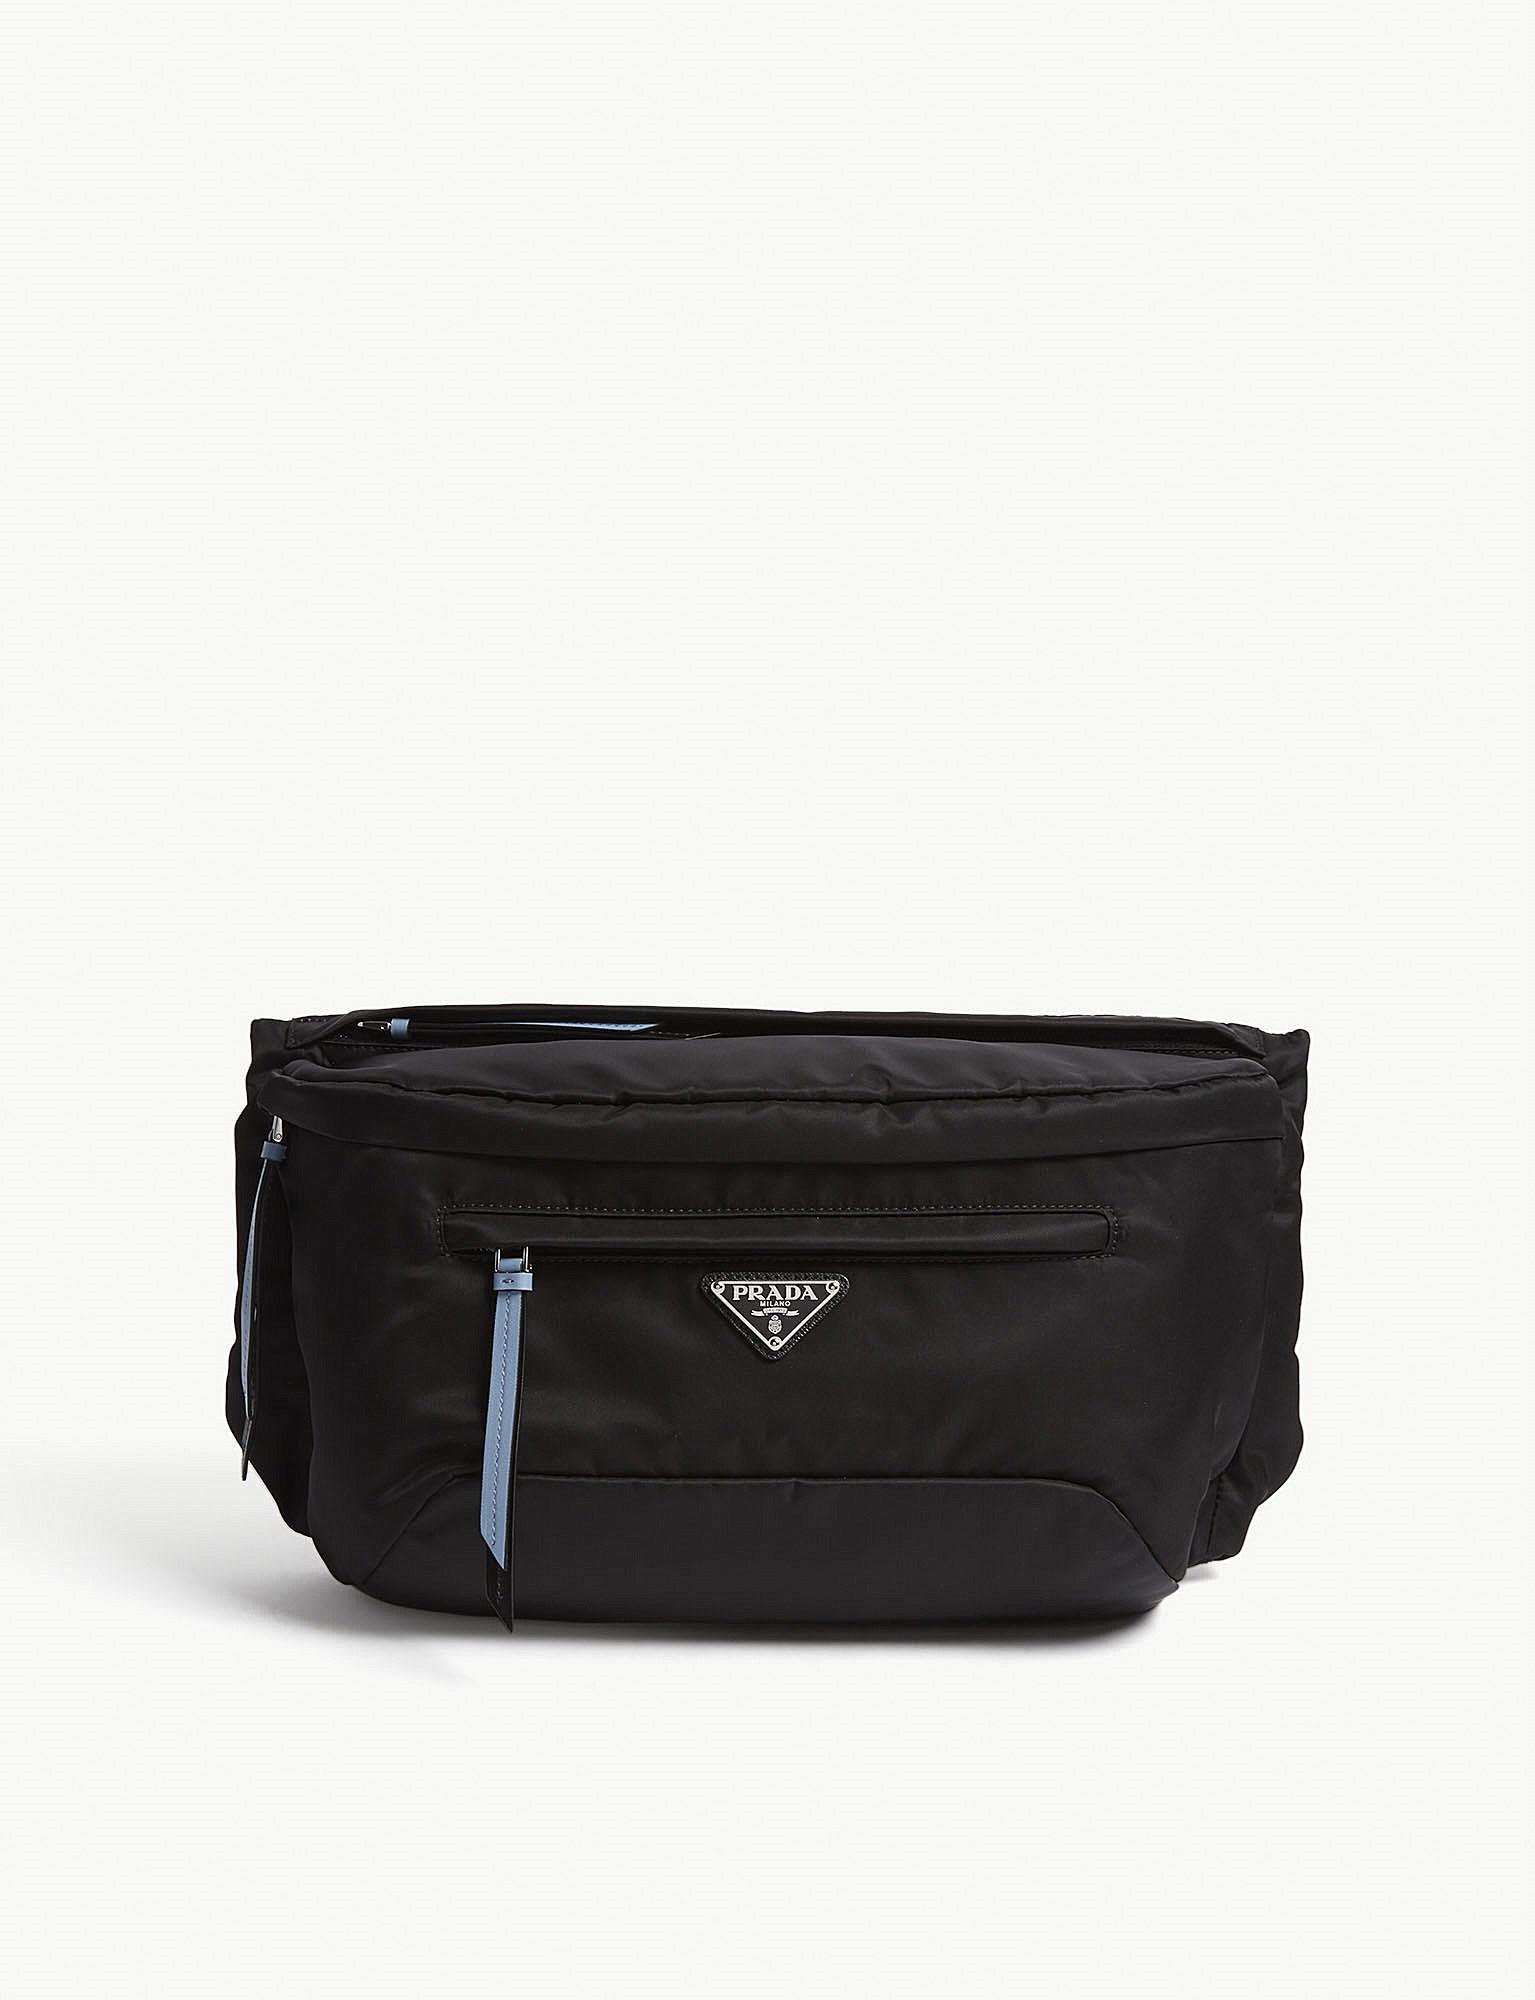 be54c73a4554 ... ireland buy online 5e64d 9a886 lyst prada tessuto mini bucket crossbody  bag in black 70bc2 9c545